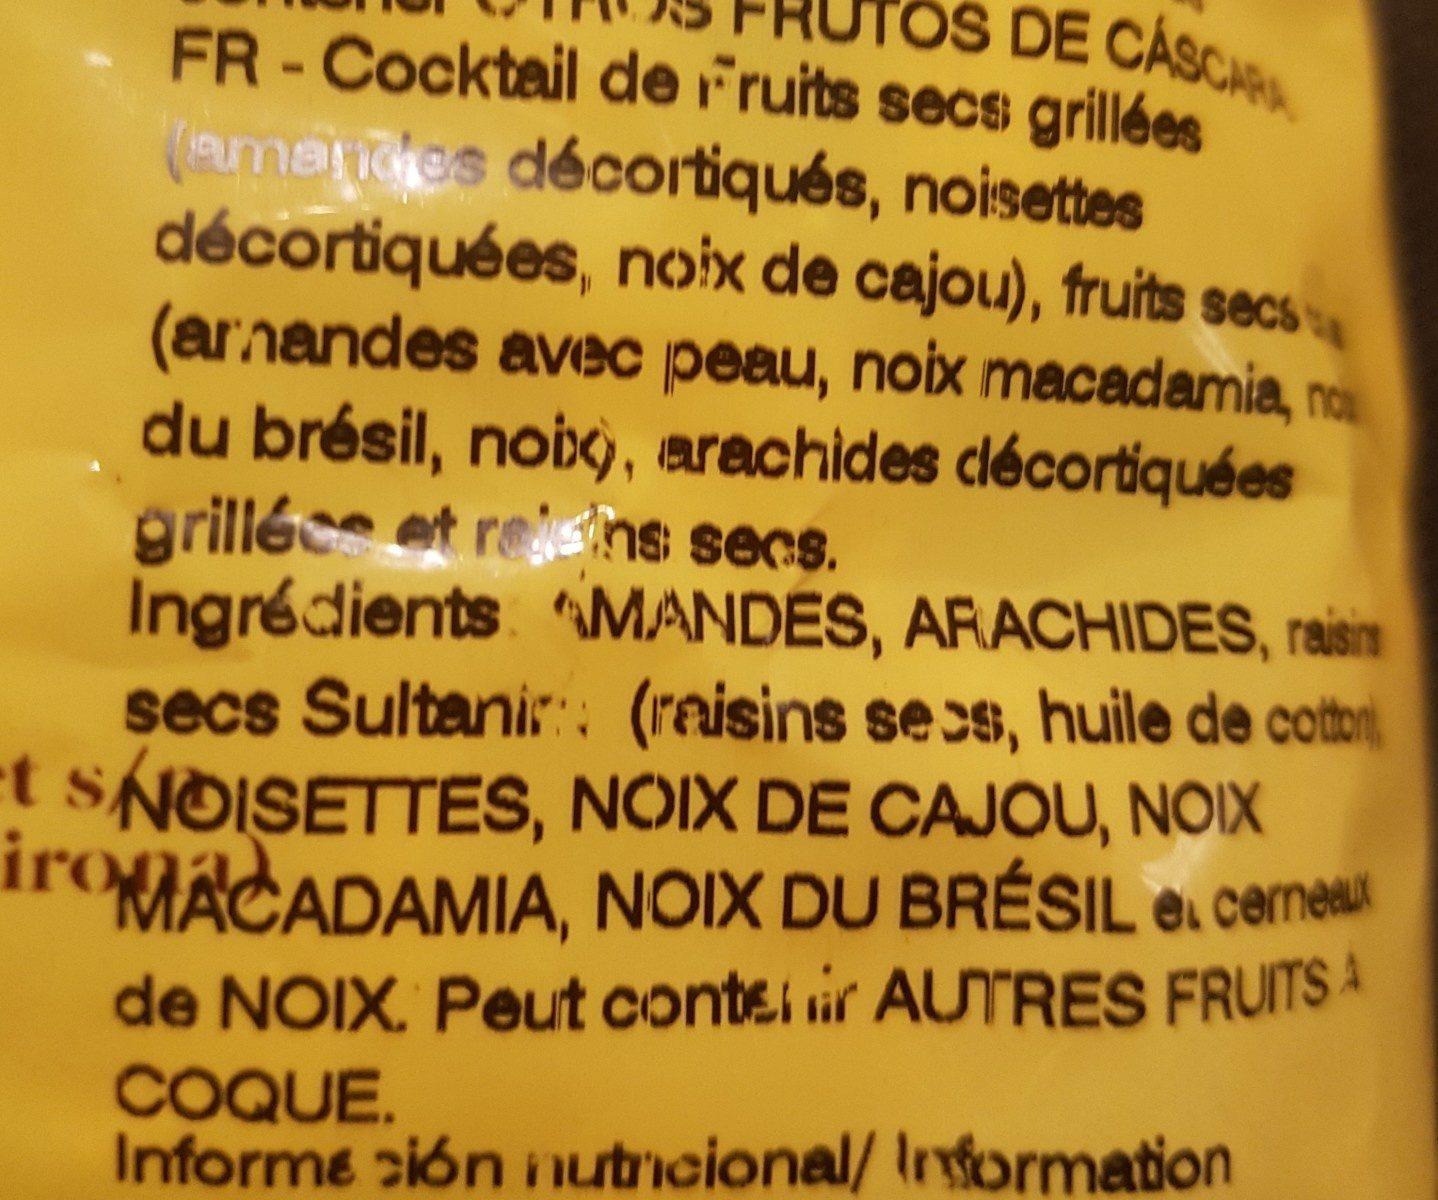 Cocktel Dietetico - Ingredients